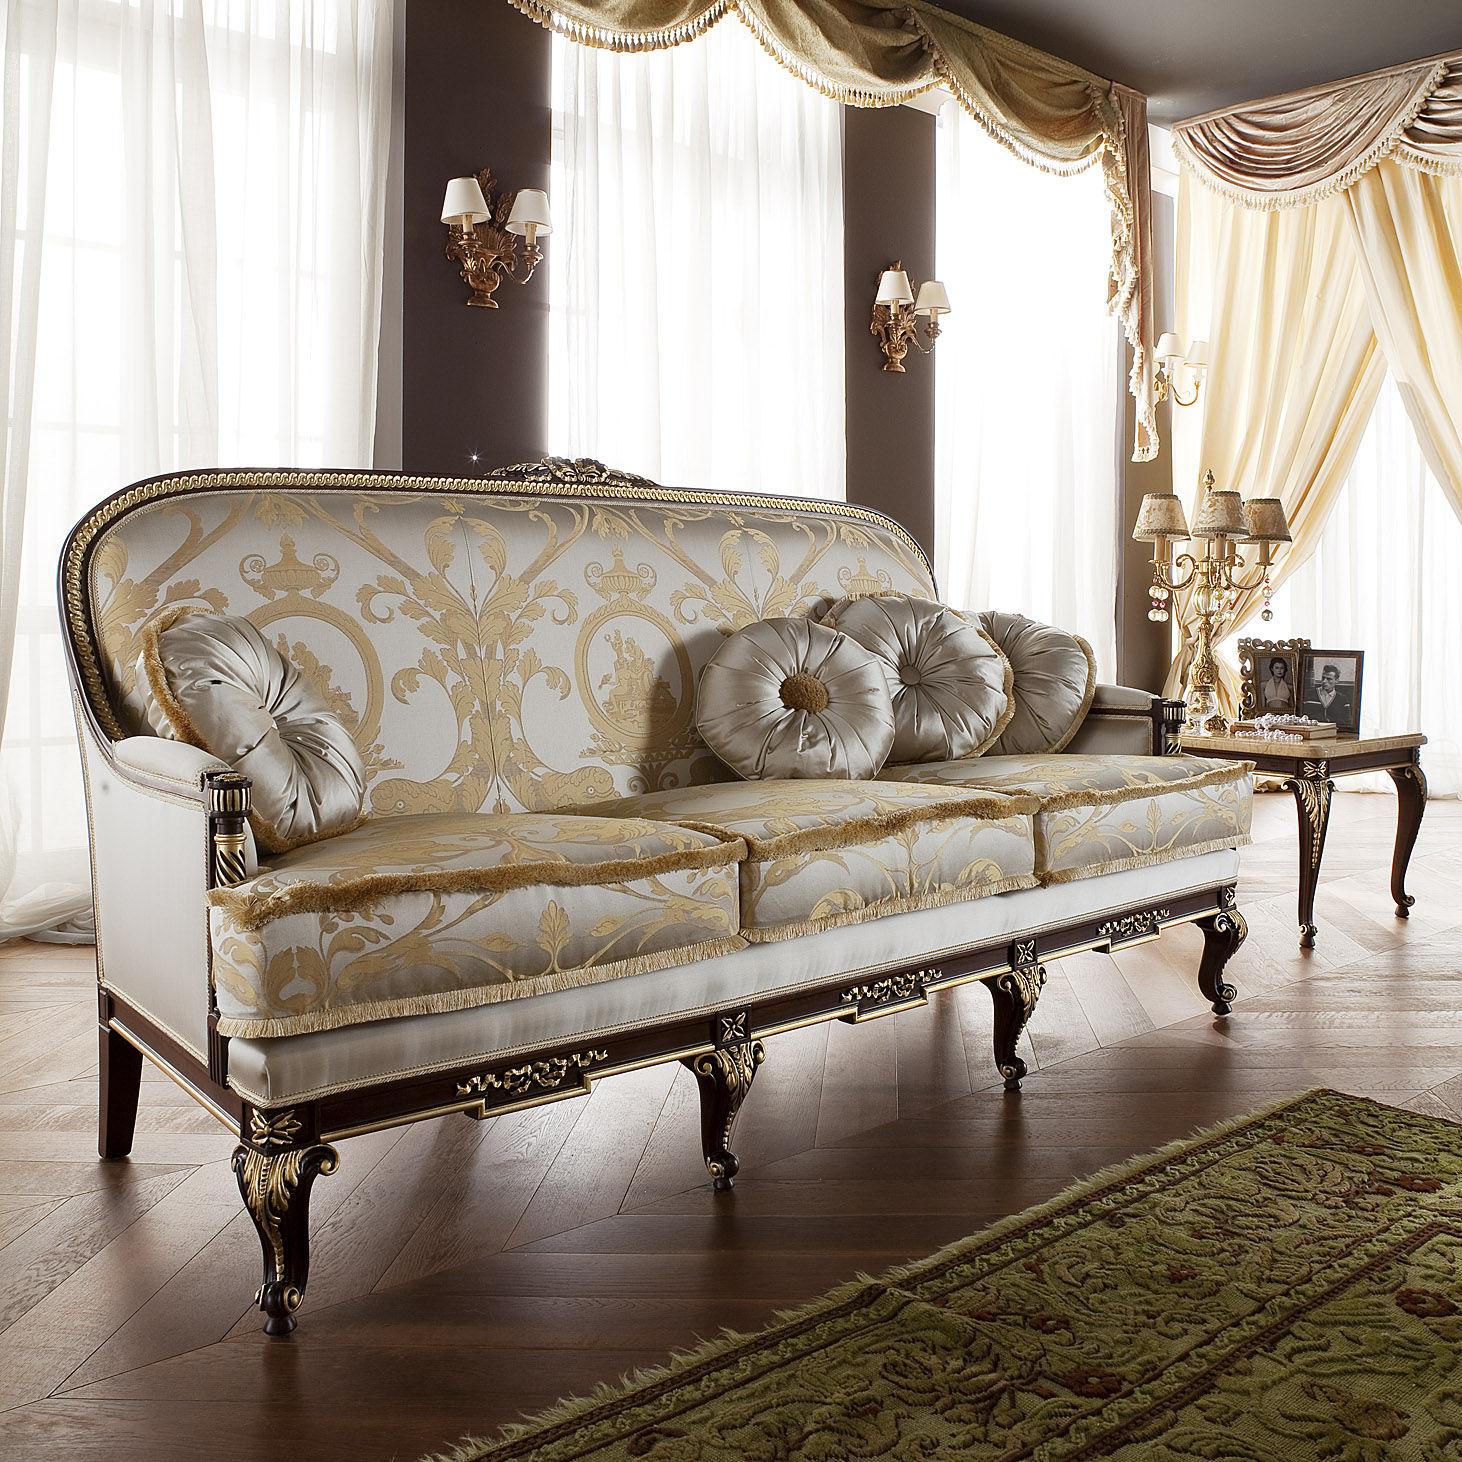 leather sofa set in dubai 8 wooden legs classic design homes billing mt homesfeed